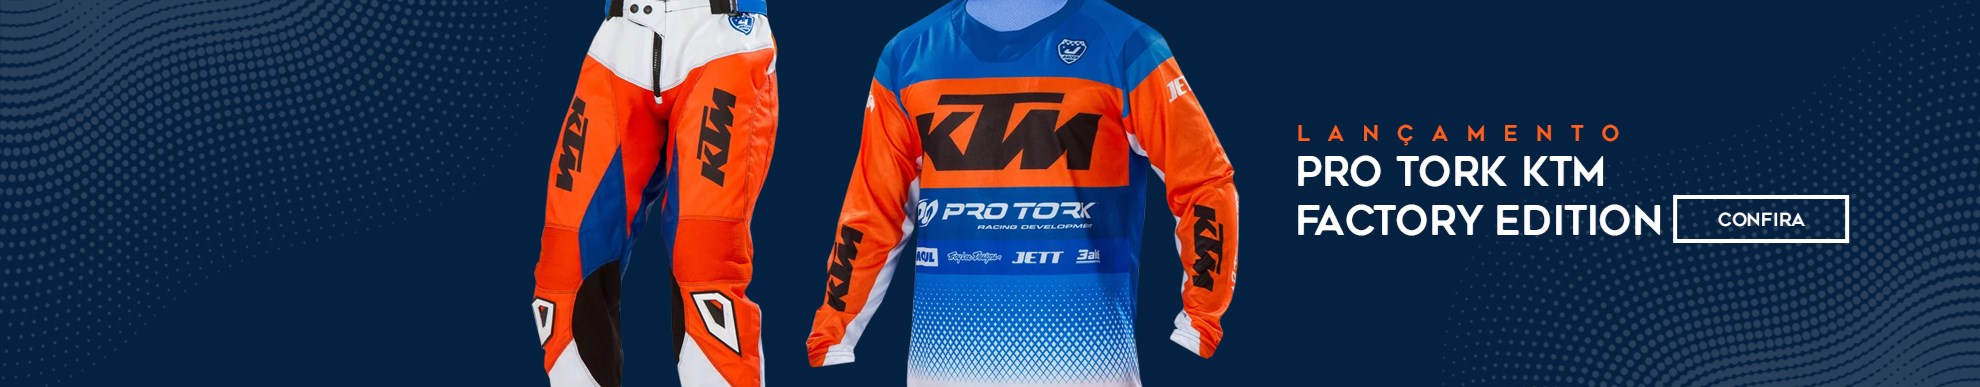 Protork KTM Factory Edition